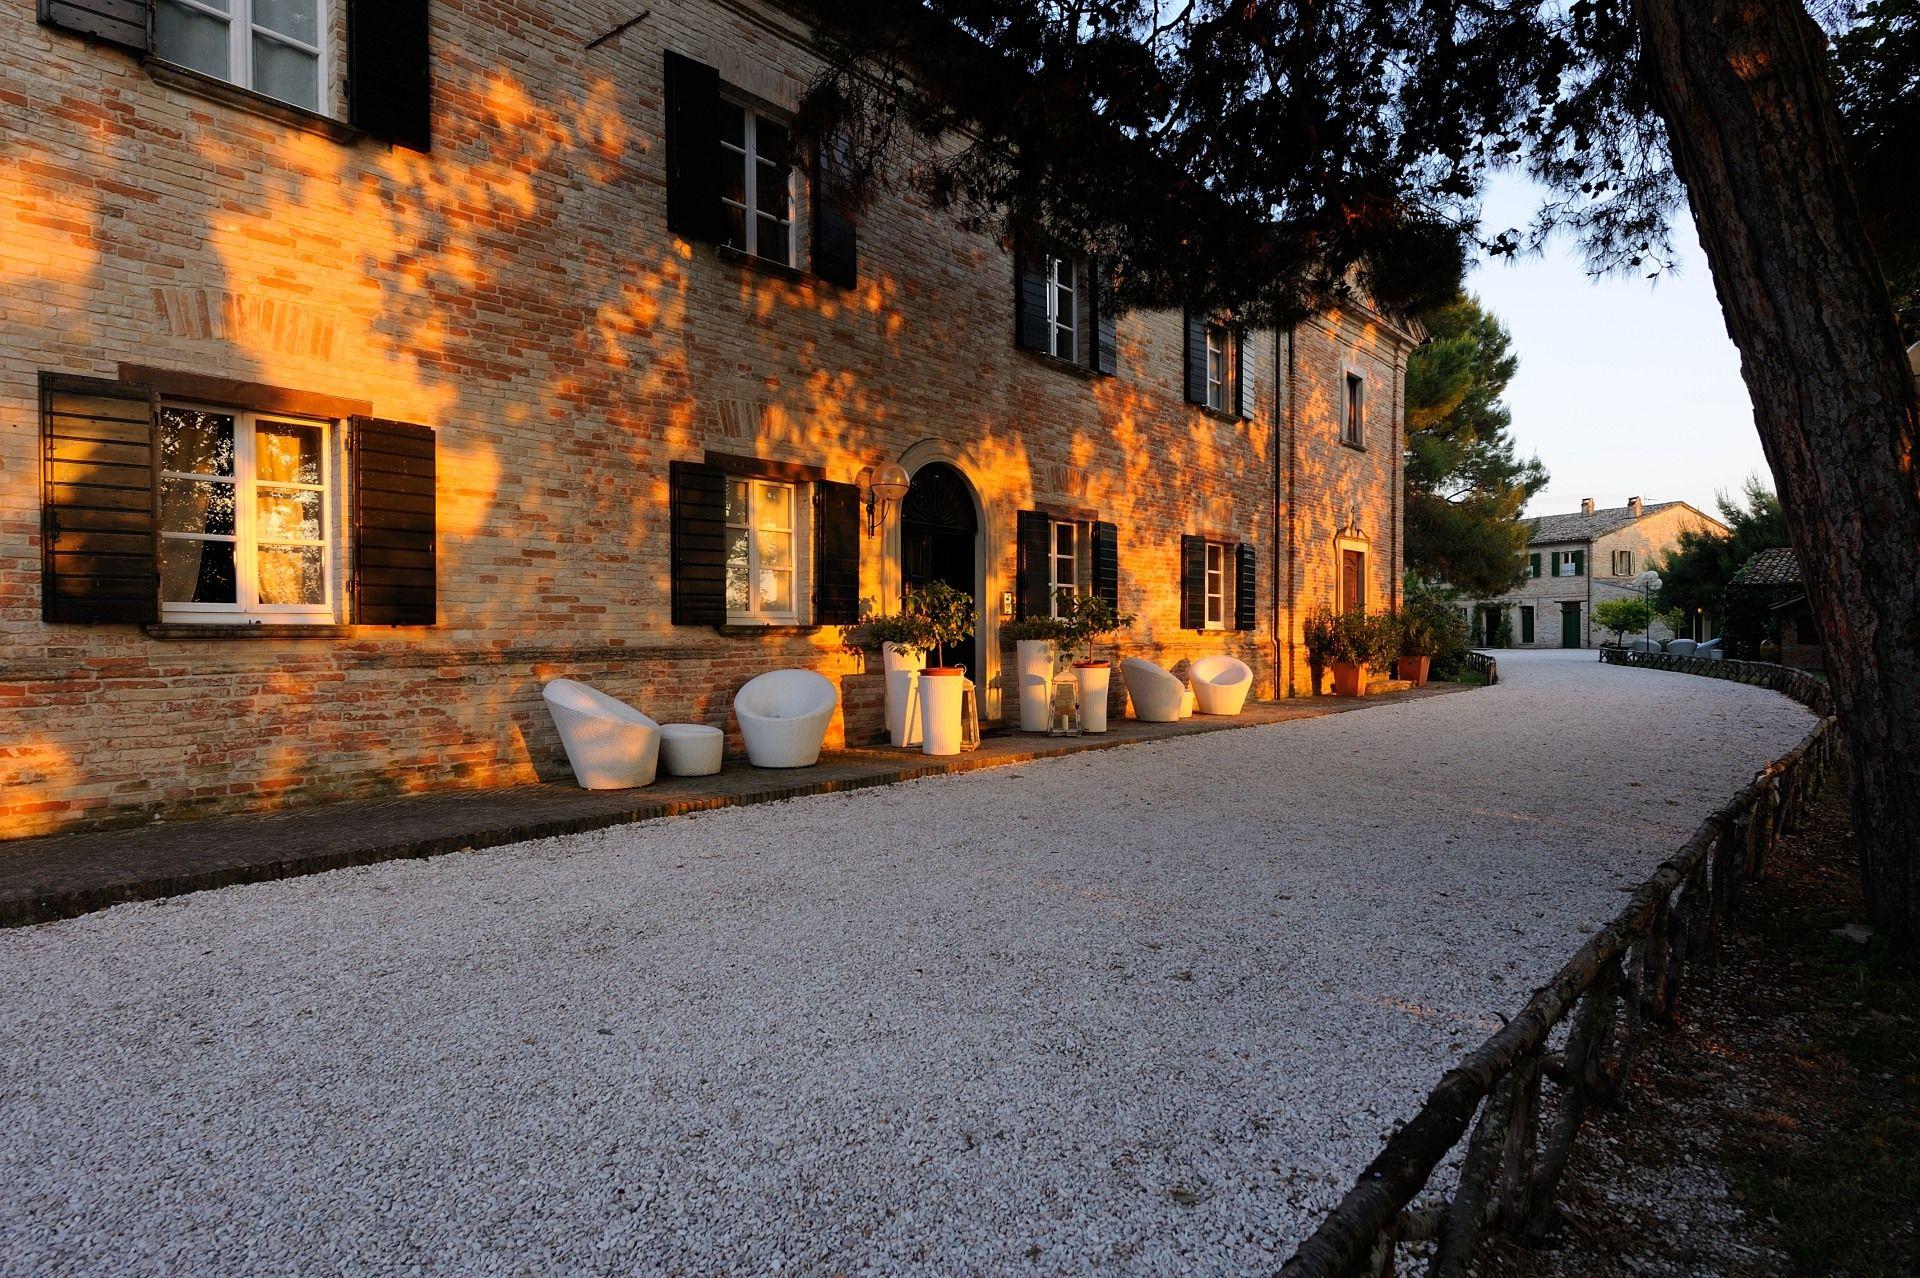 Tombolina Relais - Villa Tombolina photo 15984568